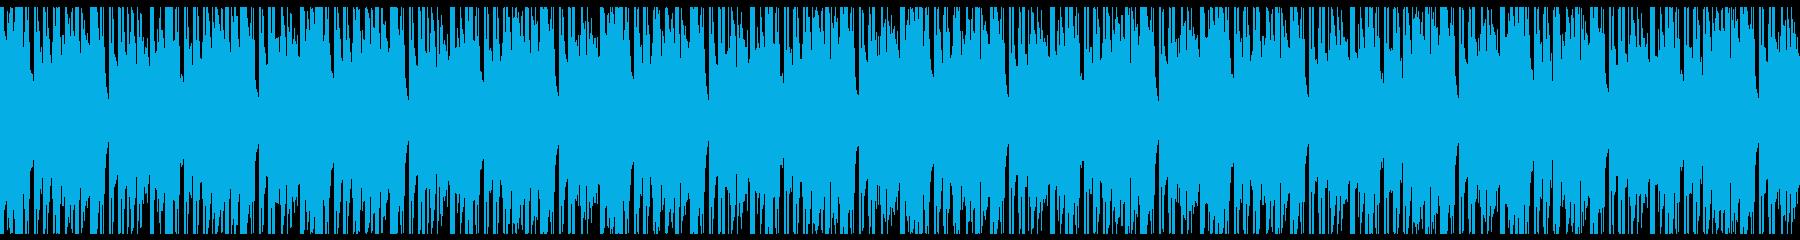 Loop 和風のサイバーヒップホップの再生済みの波形